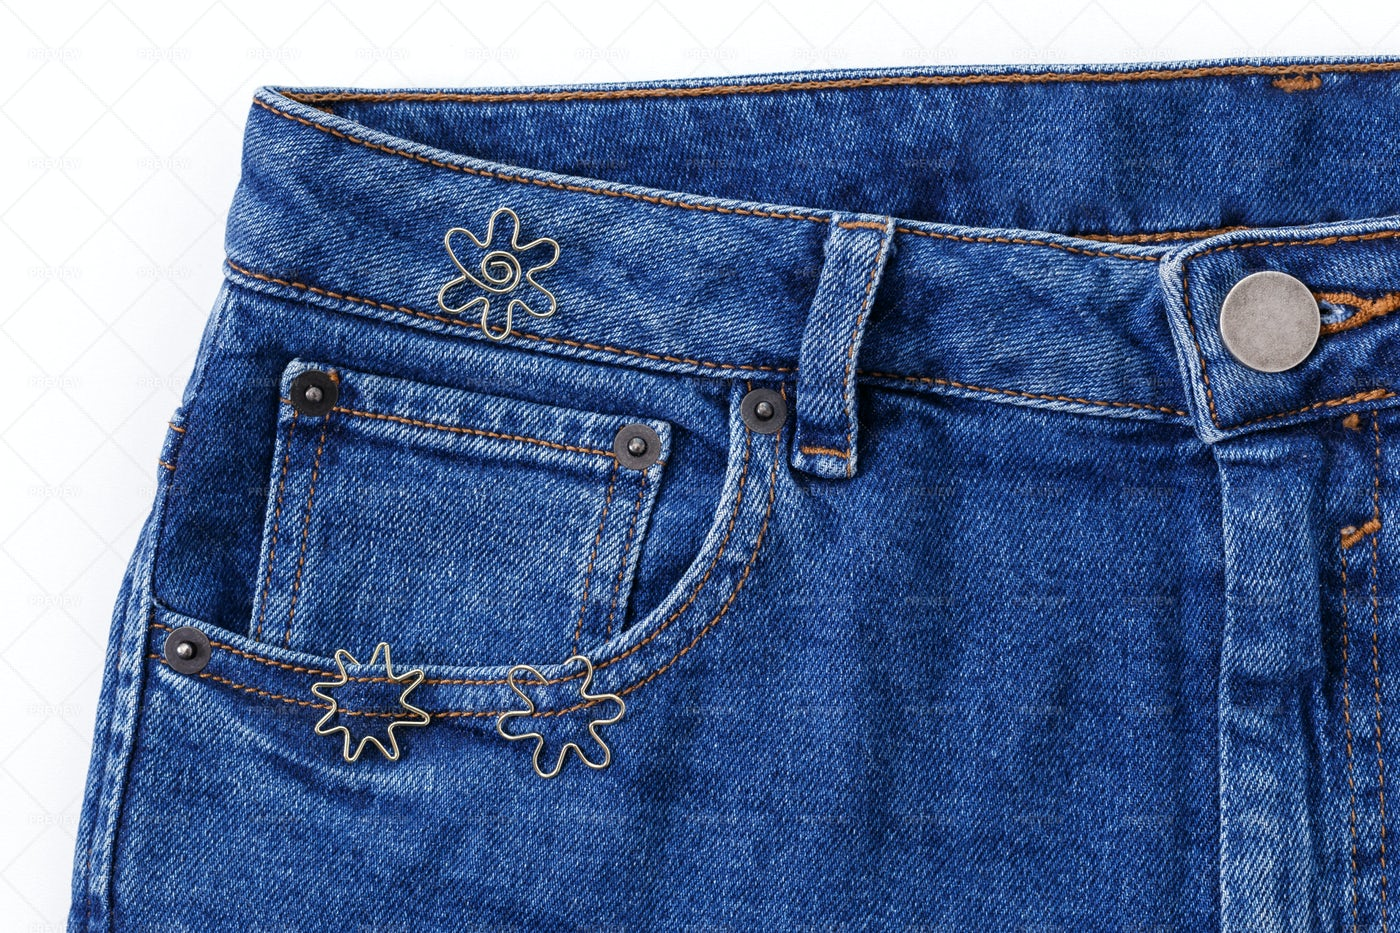 Metallic Clips On Blue Jeans: Stock Photos